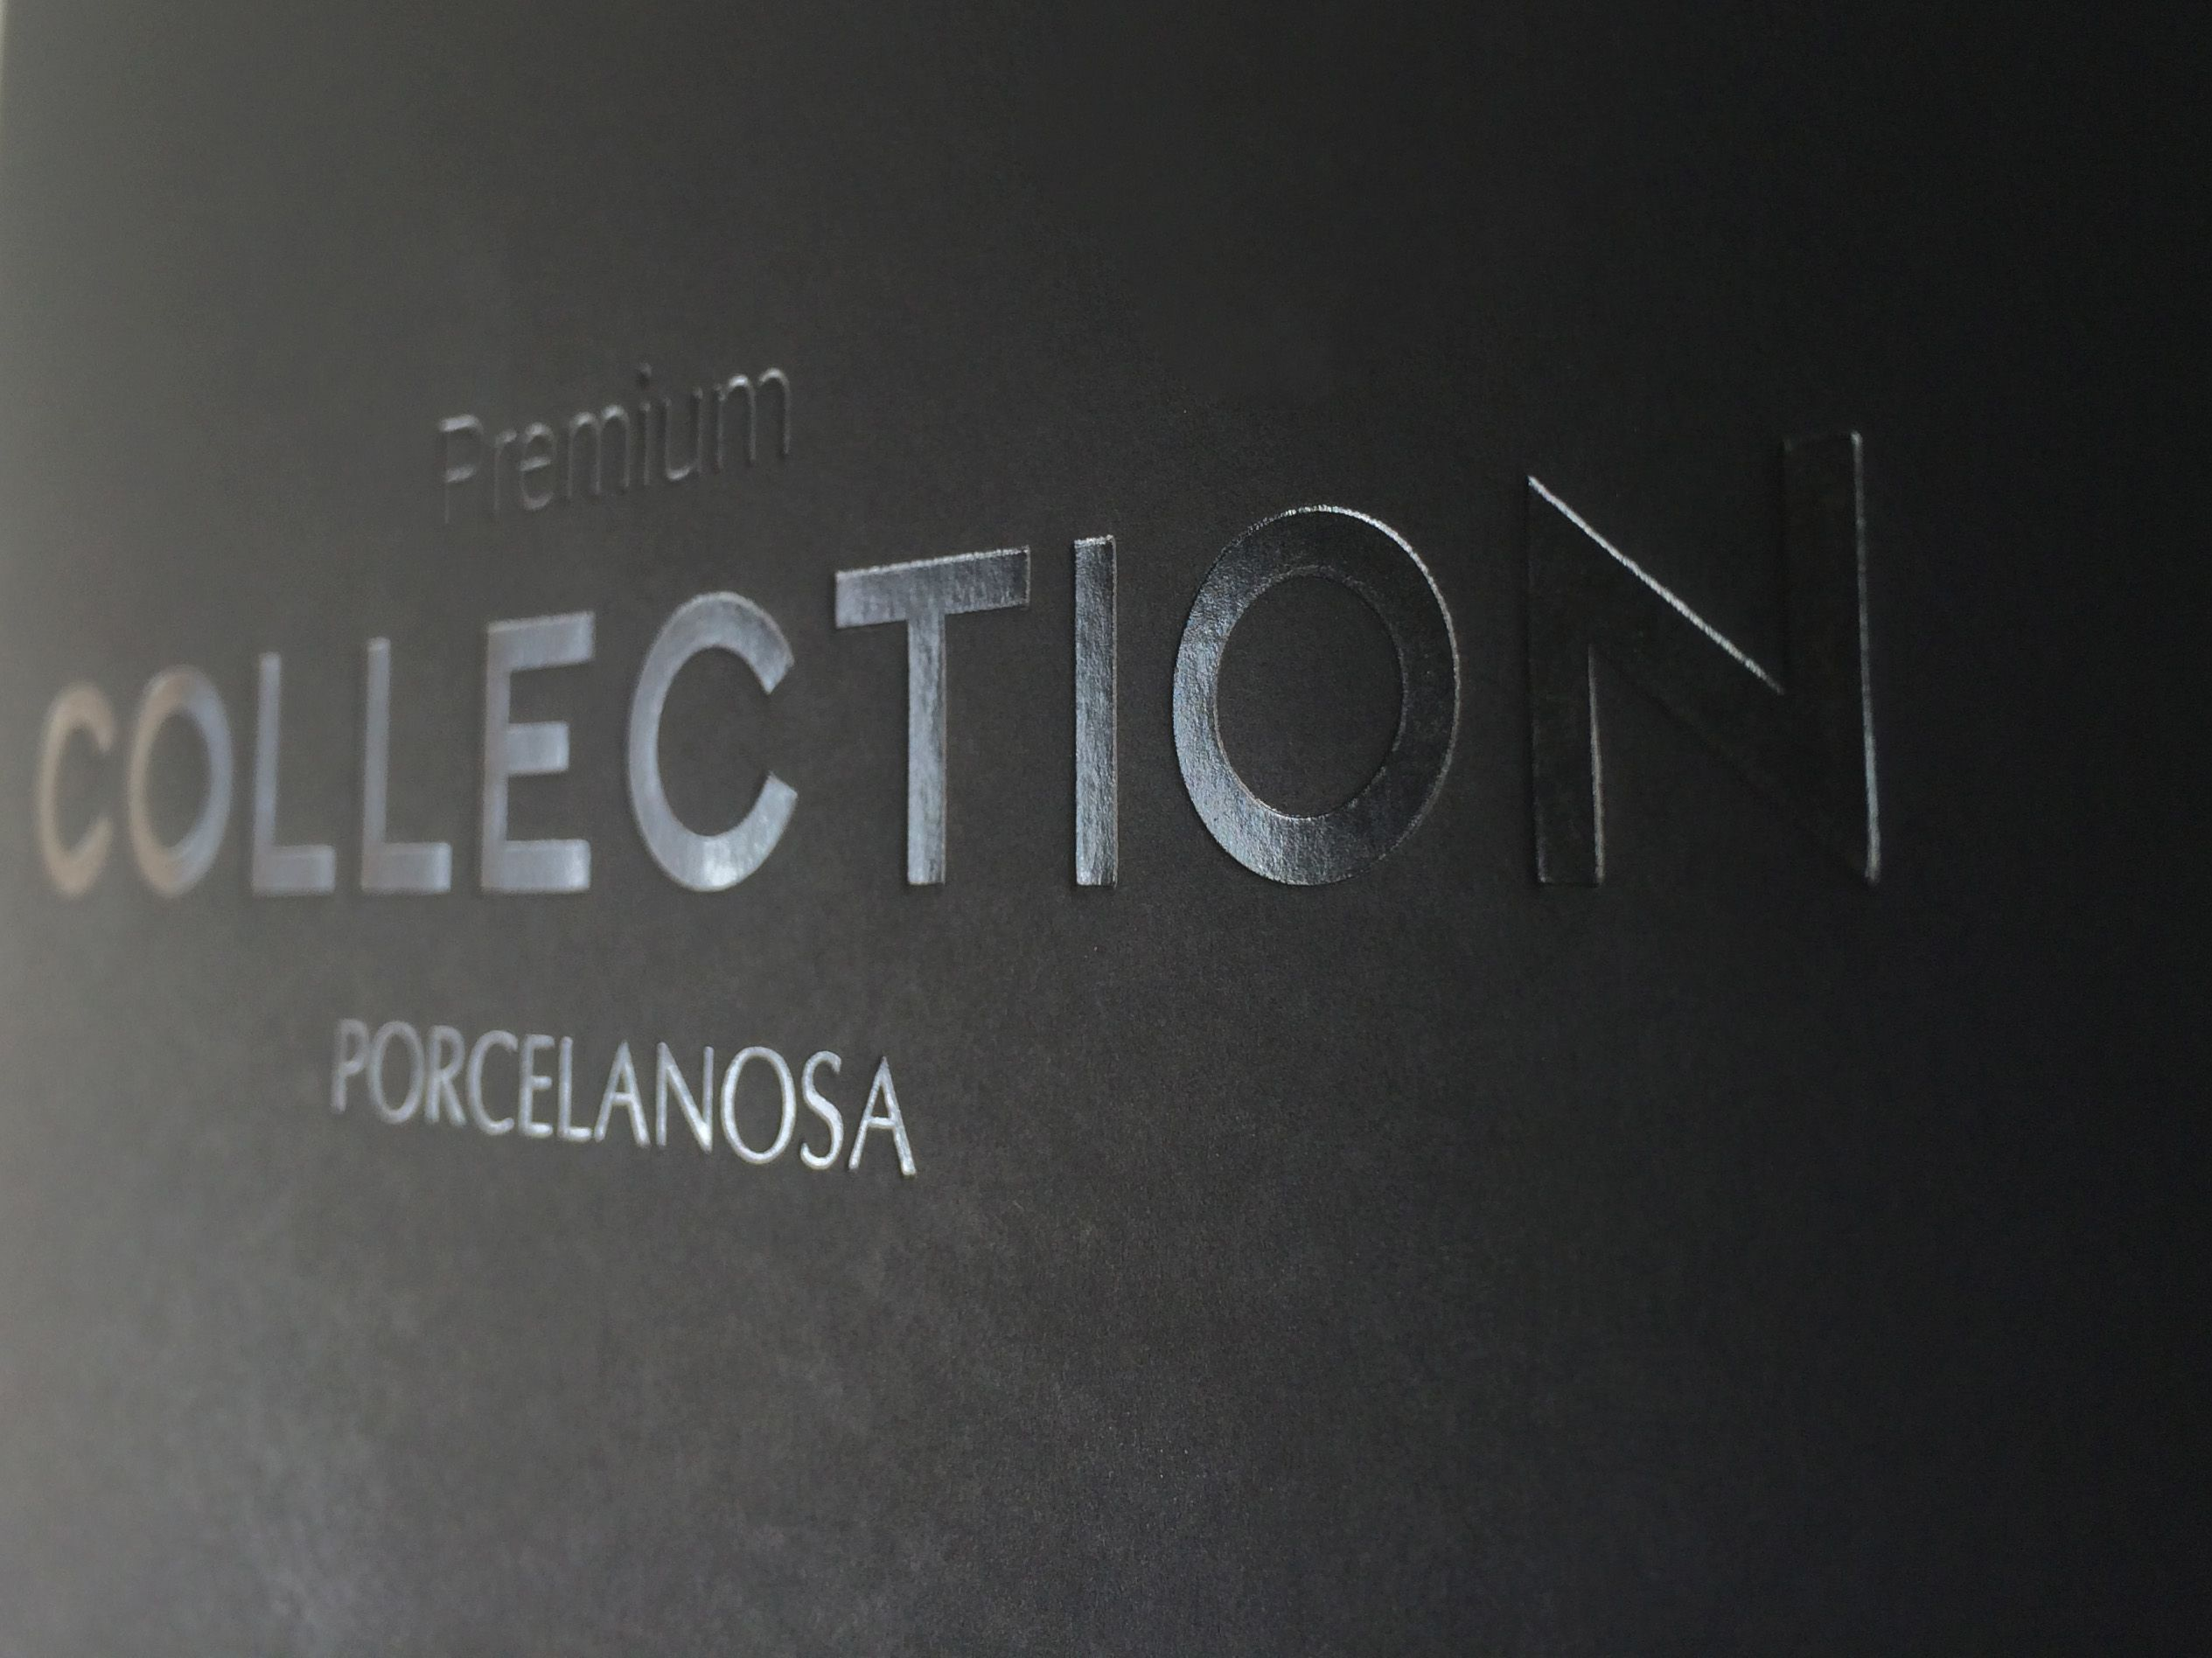 Confira este projeto do @Behance: \u201cPremium Collection Porcelanosa\u201d https://www.behance.net/gallery/47668981/Premium-Collection-Porcelanosa